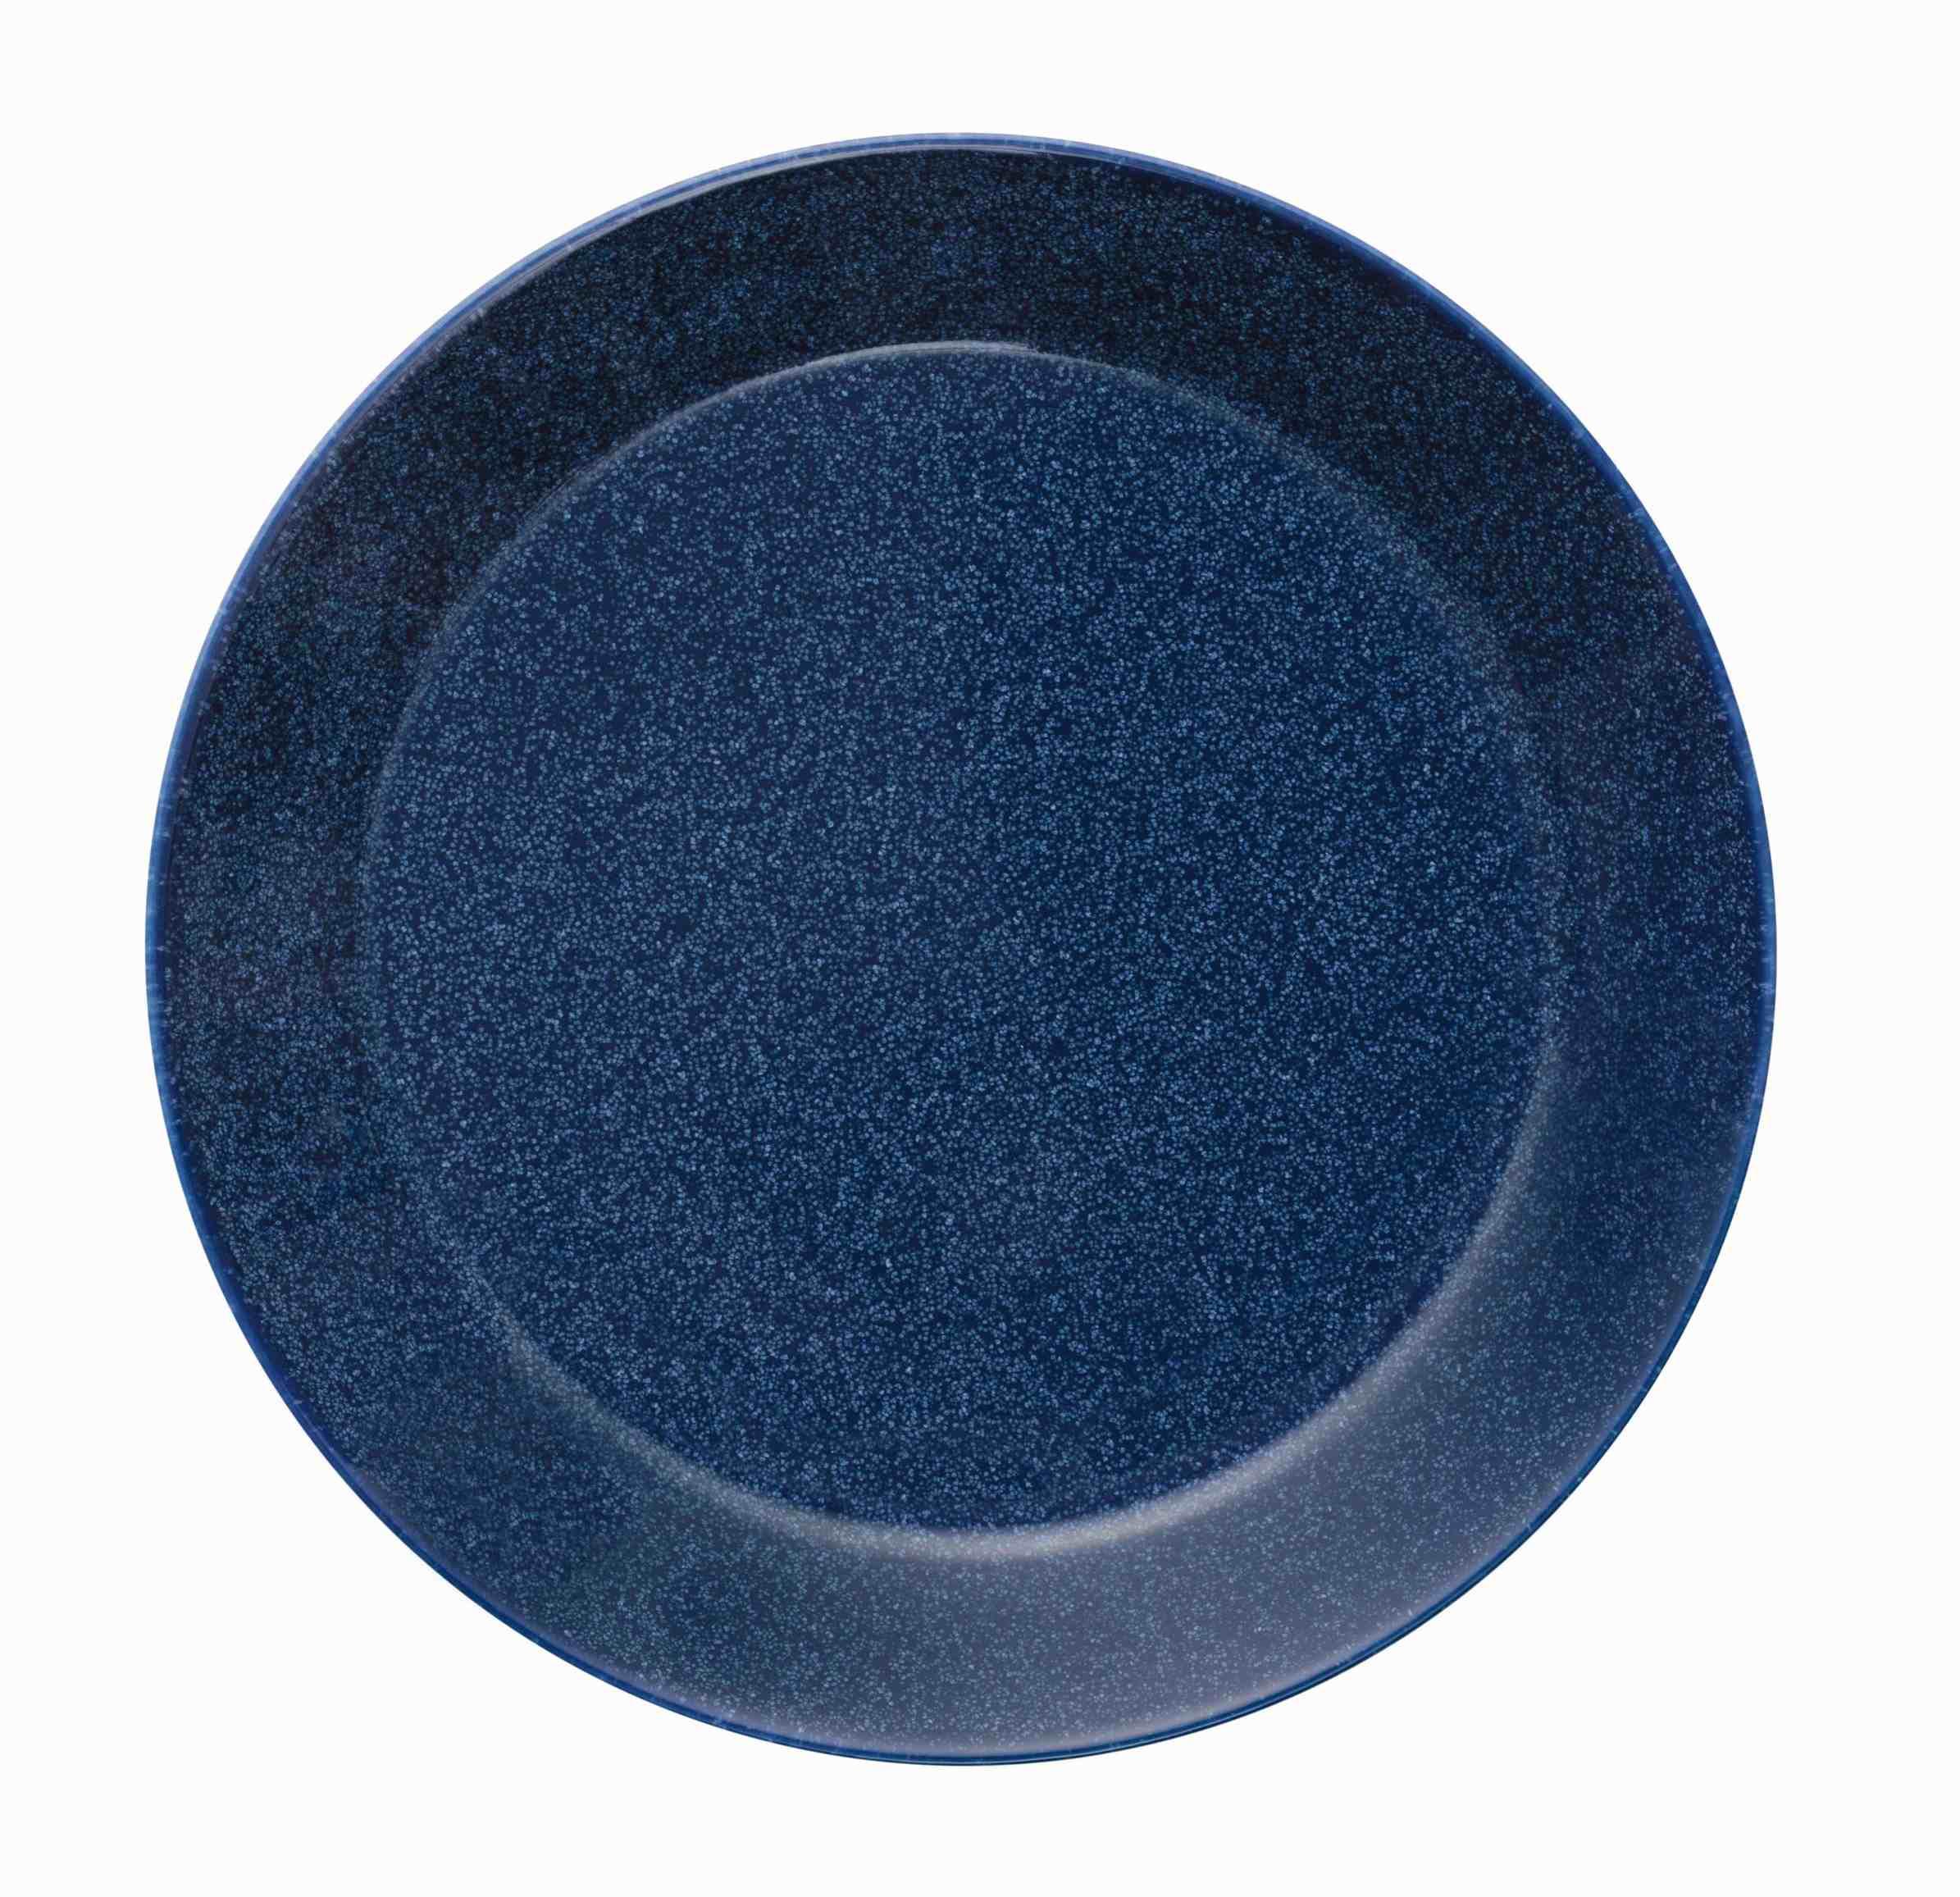 iittala teema gebaksbordje dotted blue